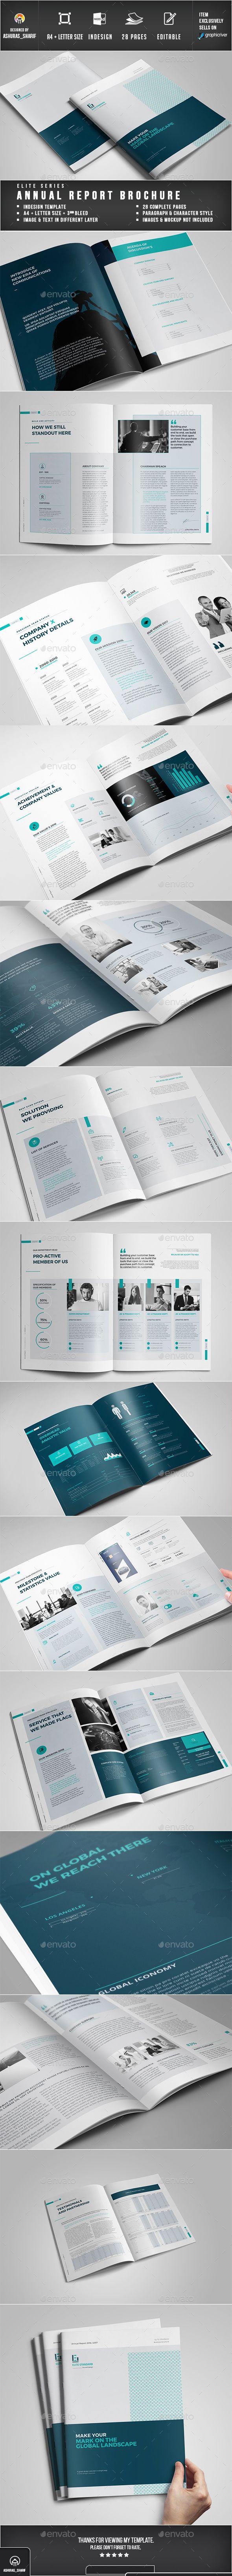 Annual Report | Folleto corporativo, Folletos y Catálogo